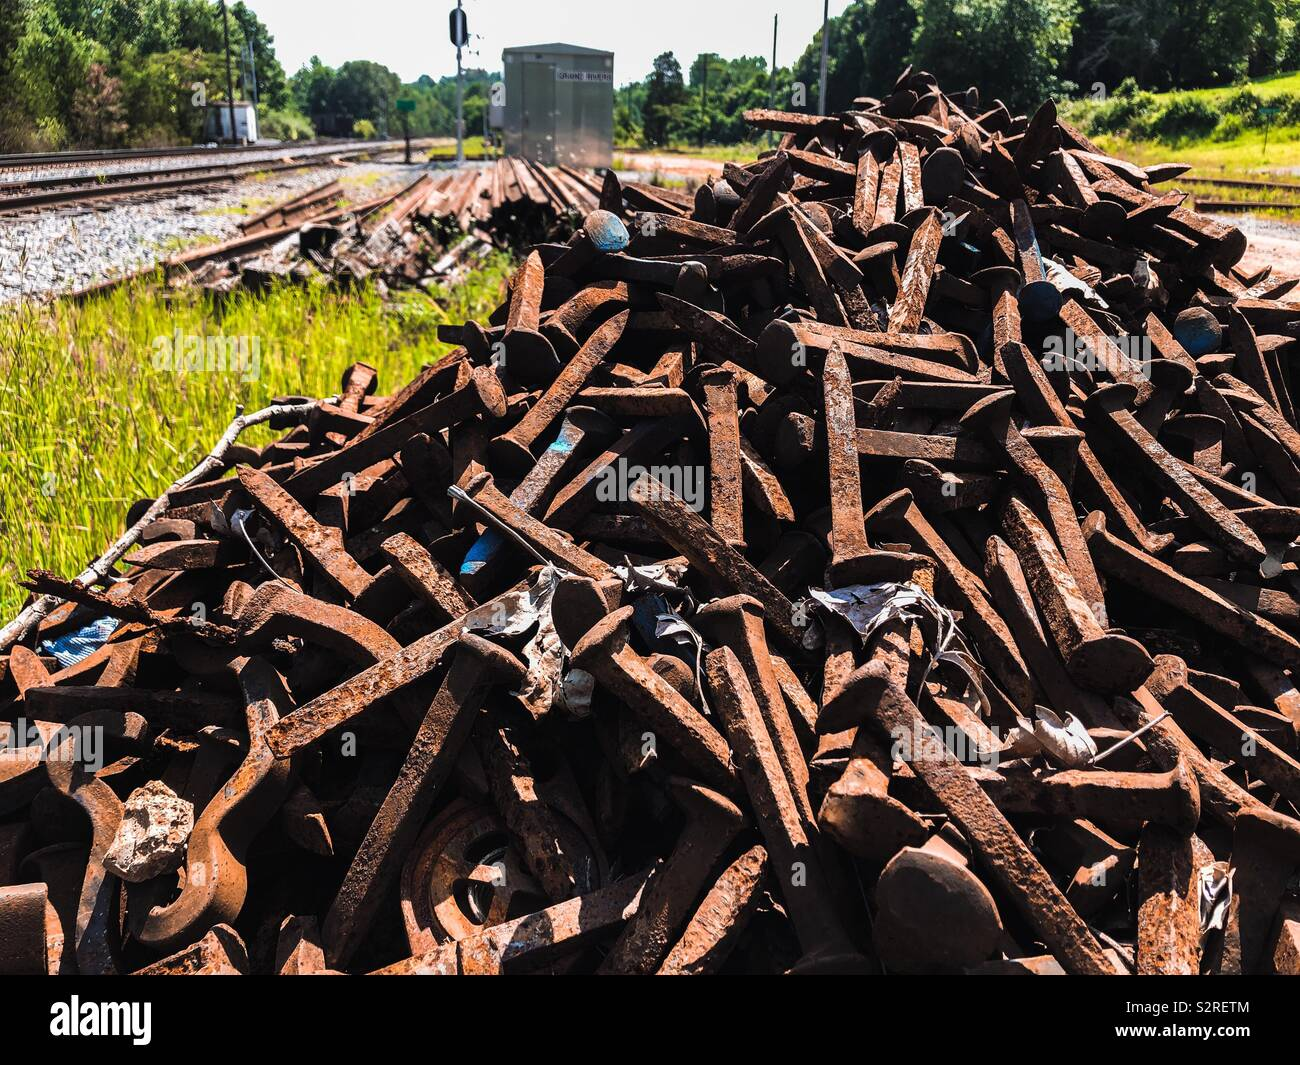 Iron Spikes Stock Photos & Iron Spikes Stock Images - Alamy